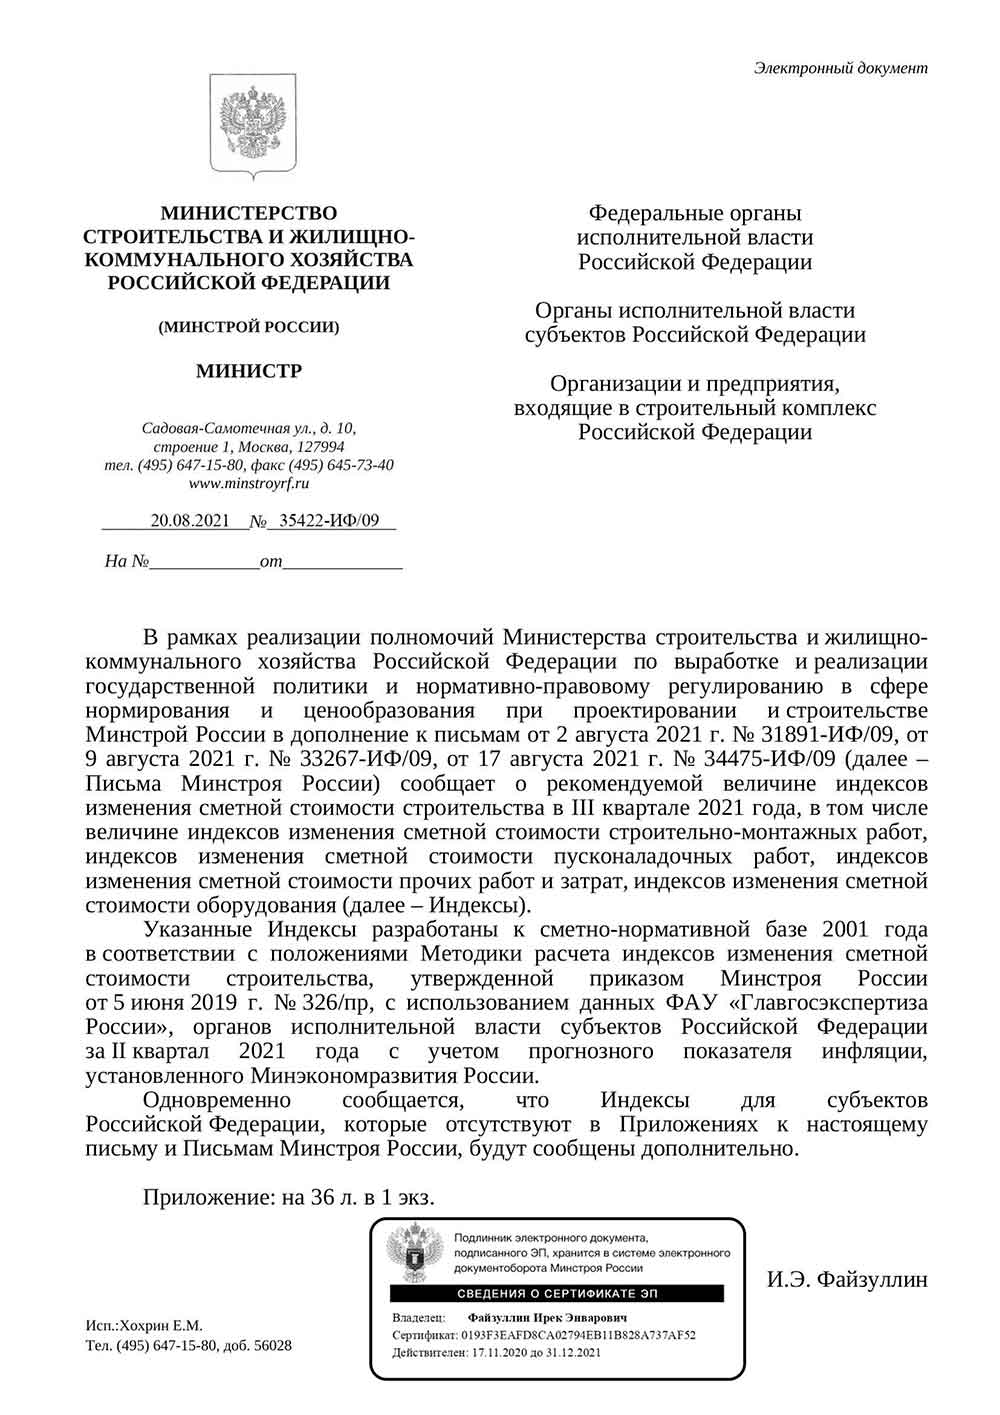 Письмо Минстроя РФ №35422-ИФ/09 от 20.08.2021 г.